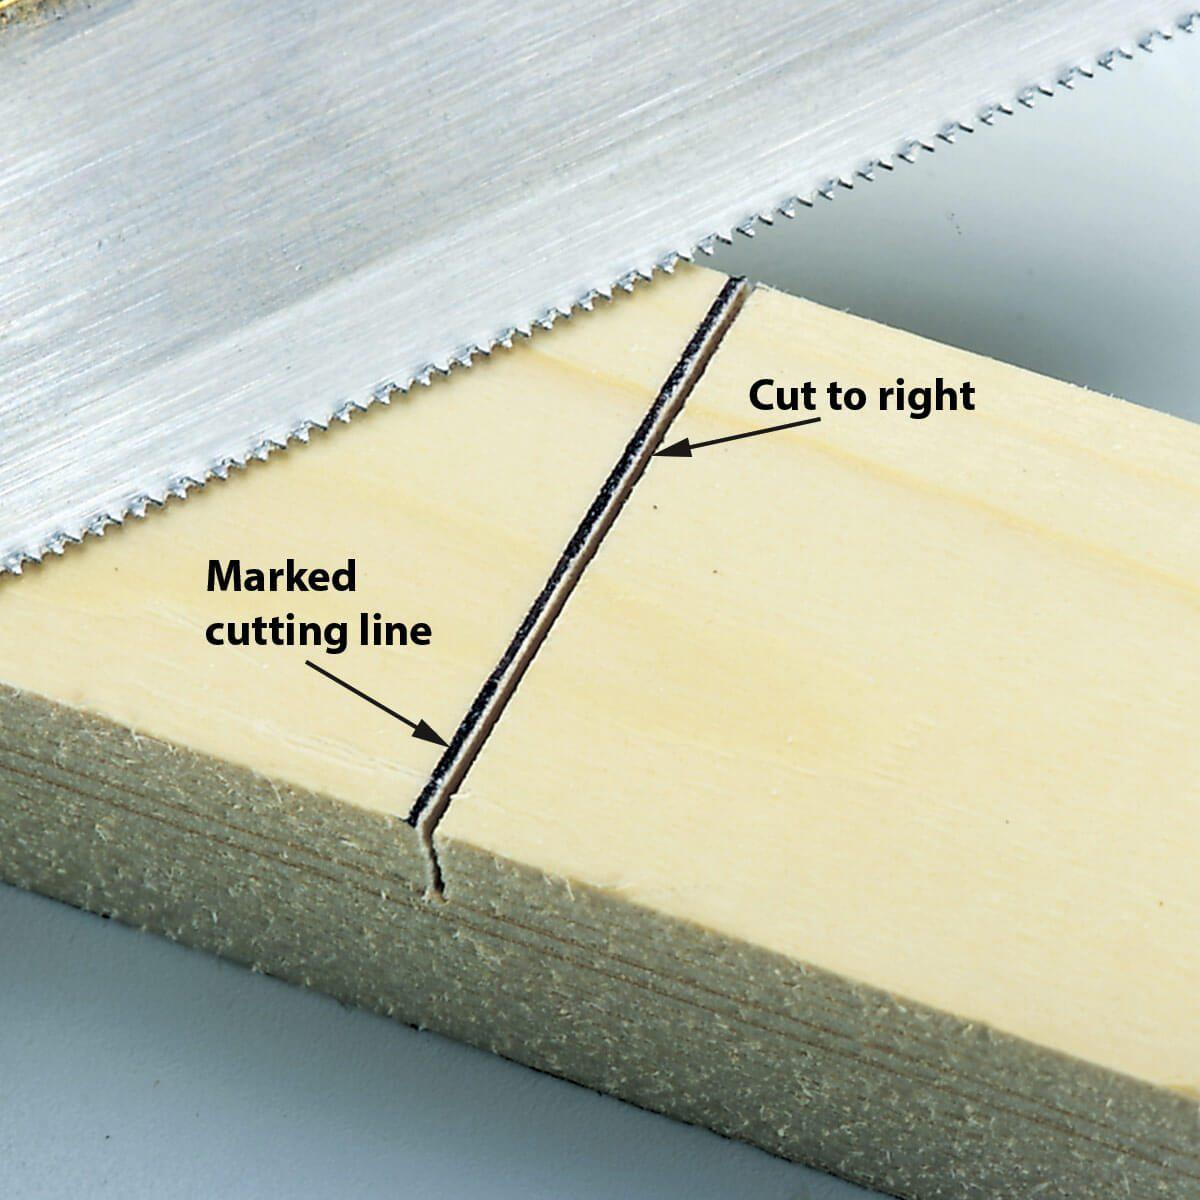 cut line and cut